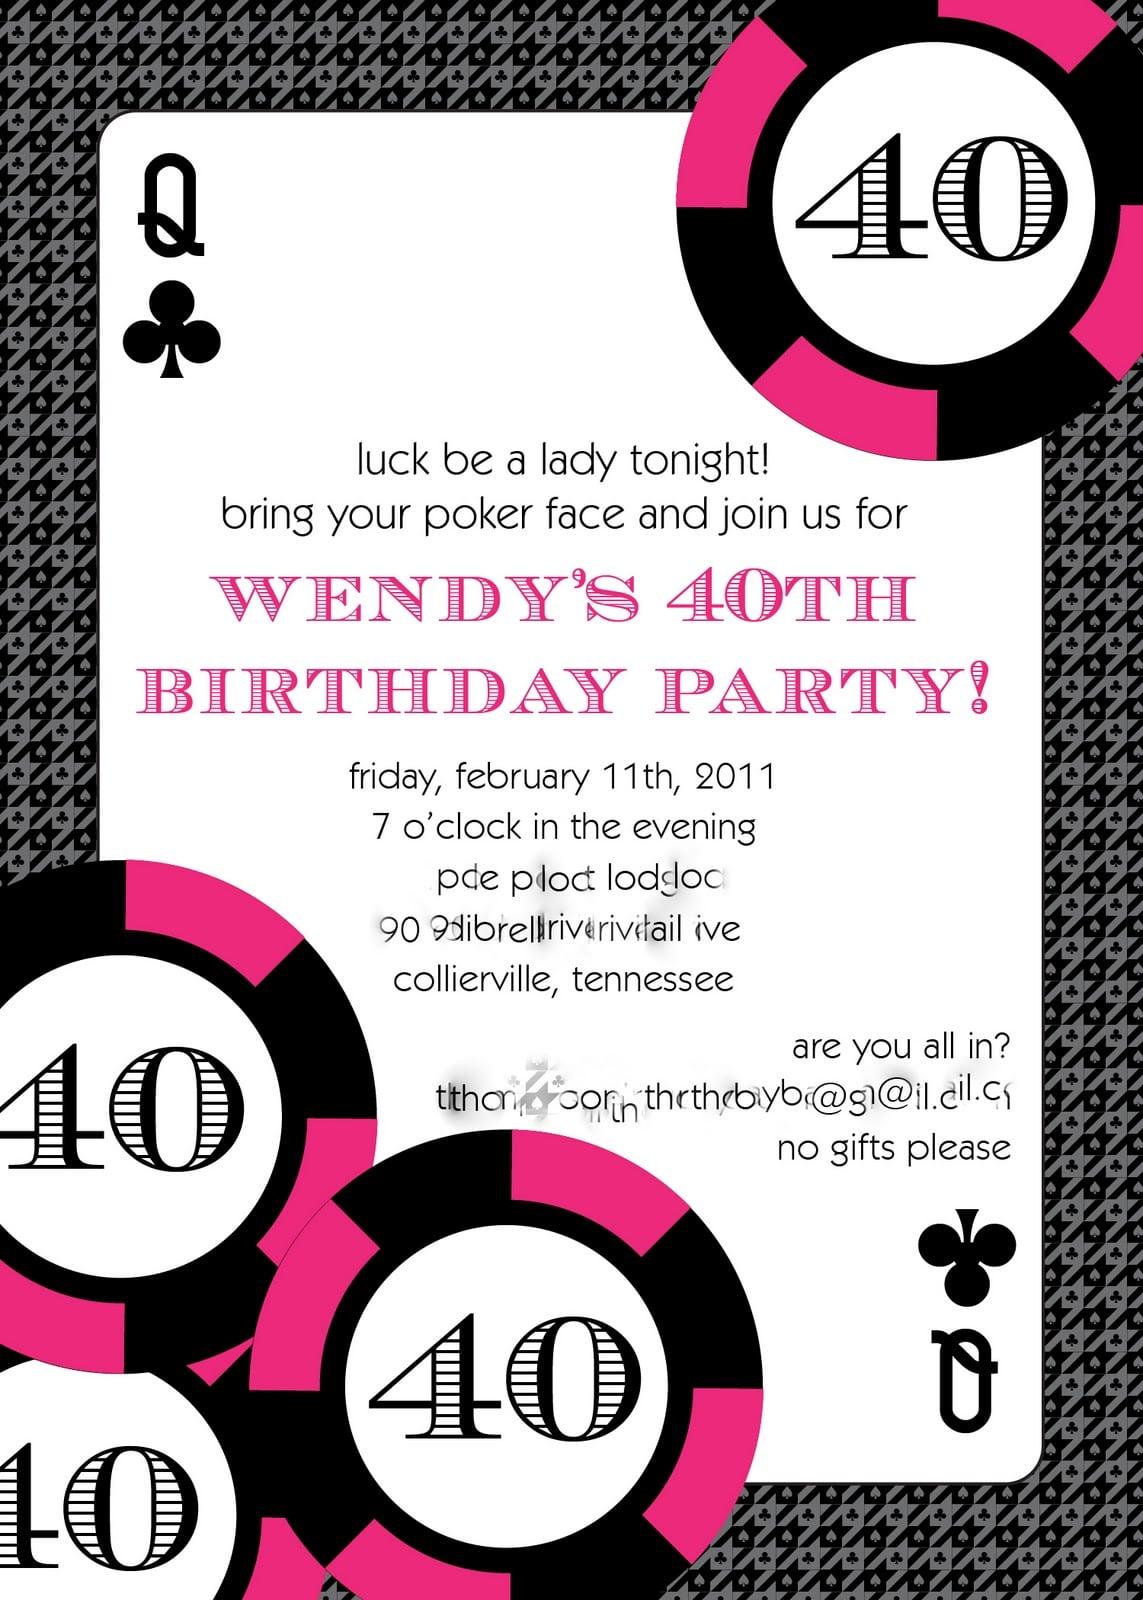 Licious 40th Birthday Party Invitations Wording Ideas Birthday